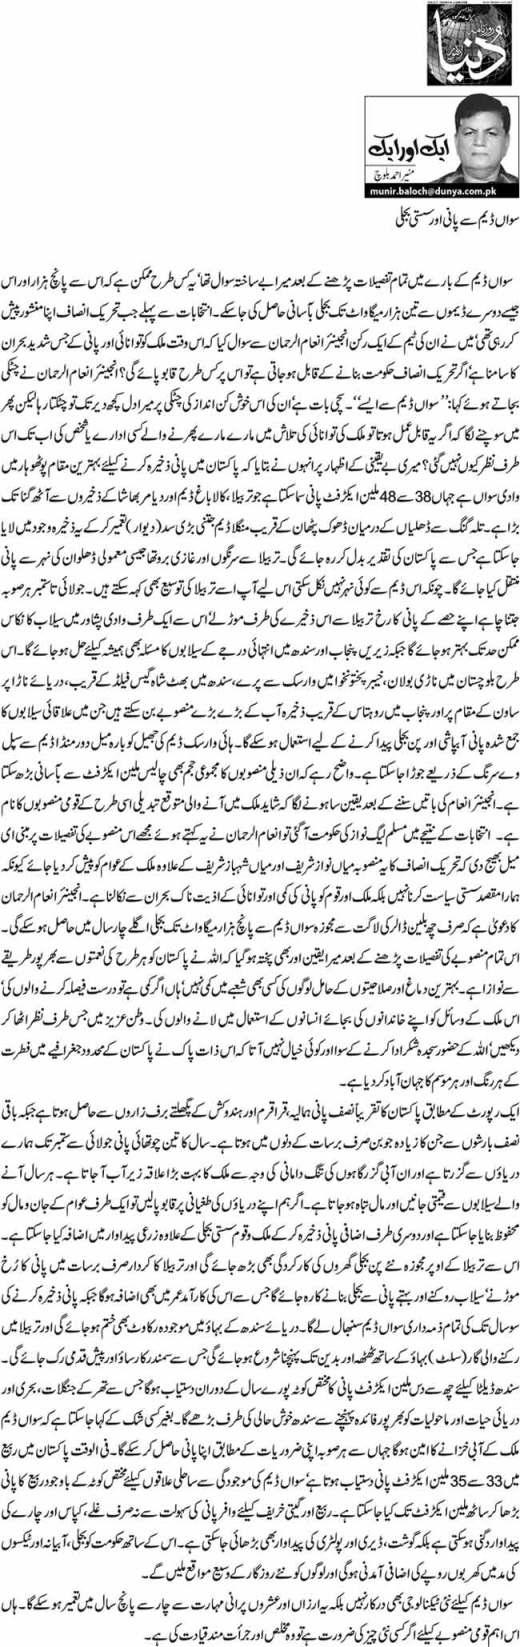 Swaan Dam Se Pani Aur Sasti Bijli - Munir Ahmed Baloch